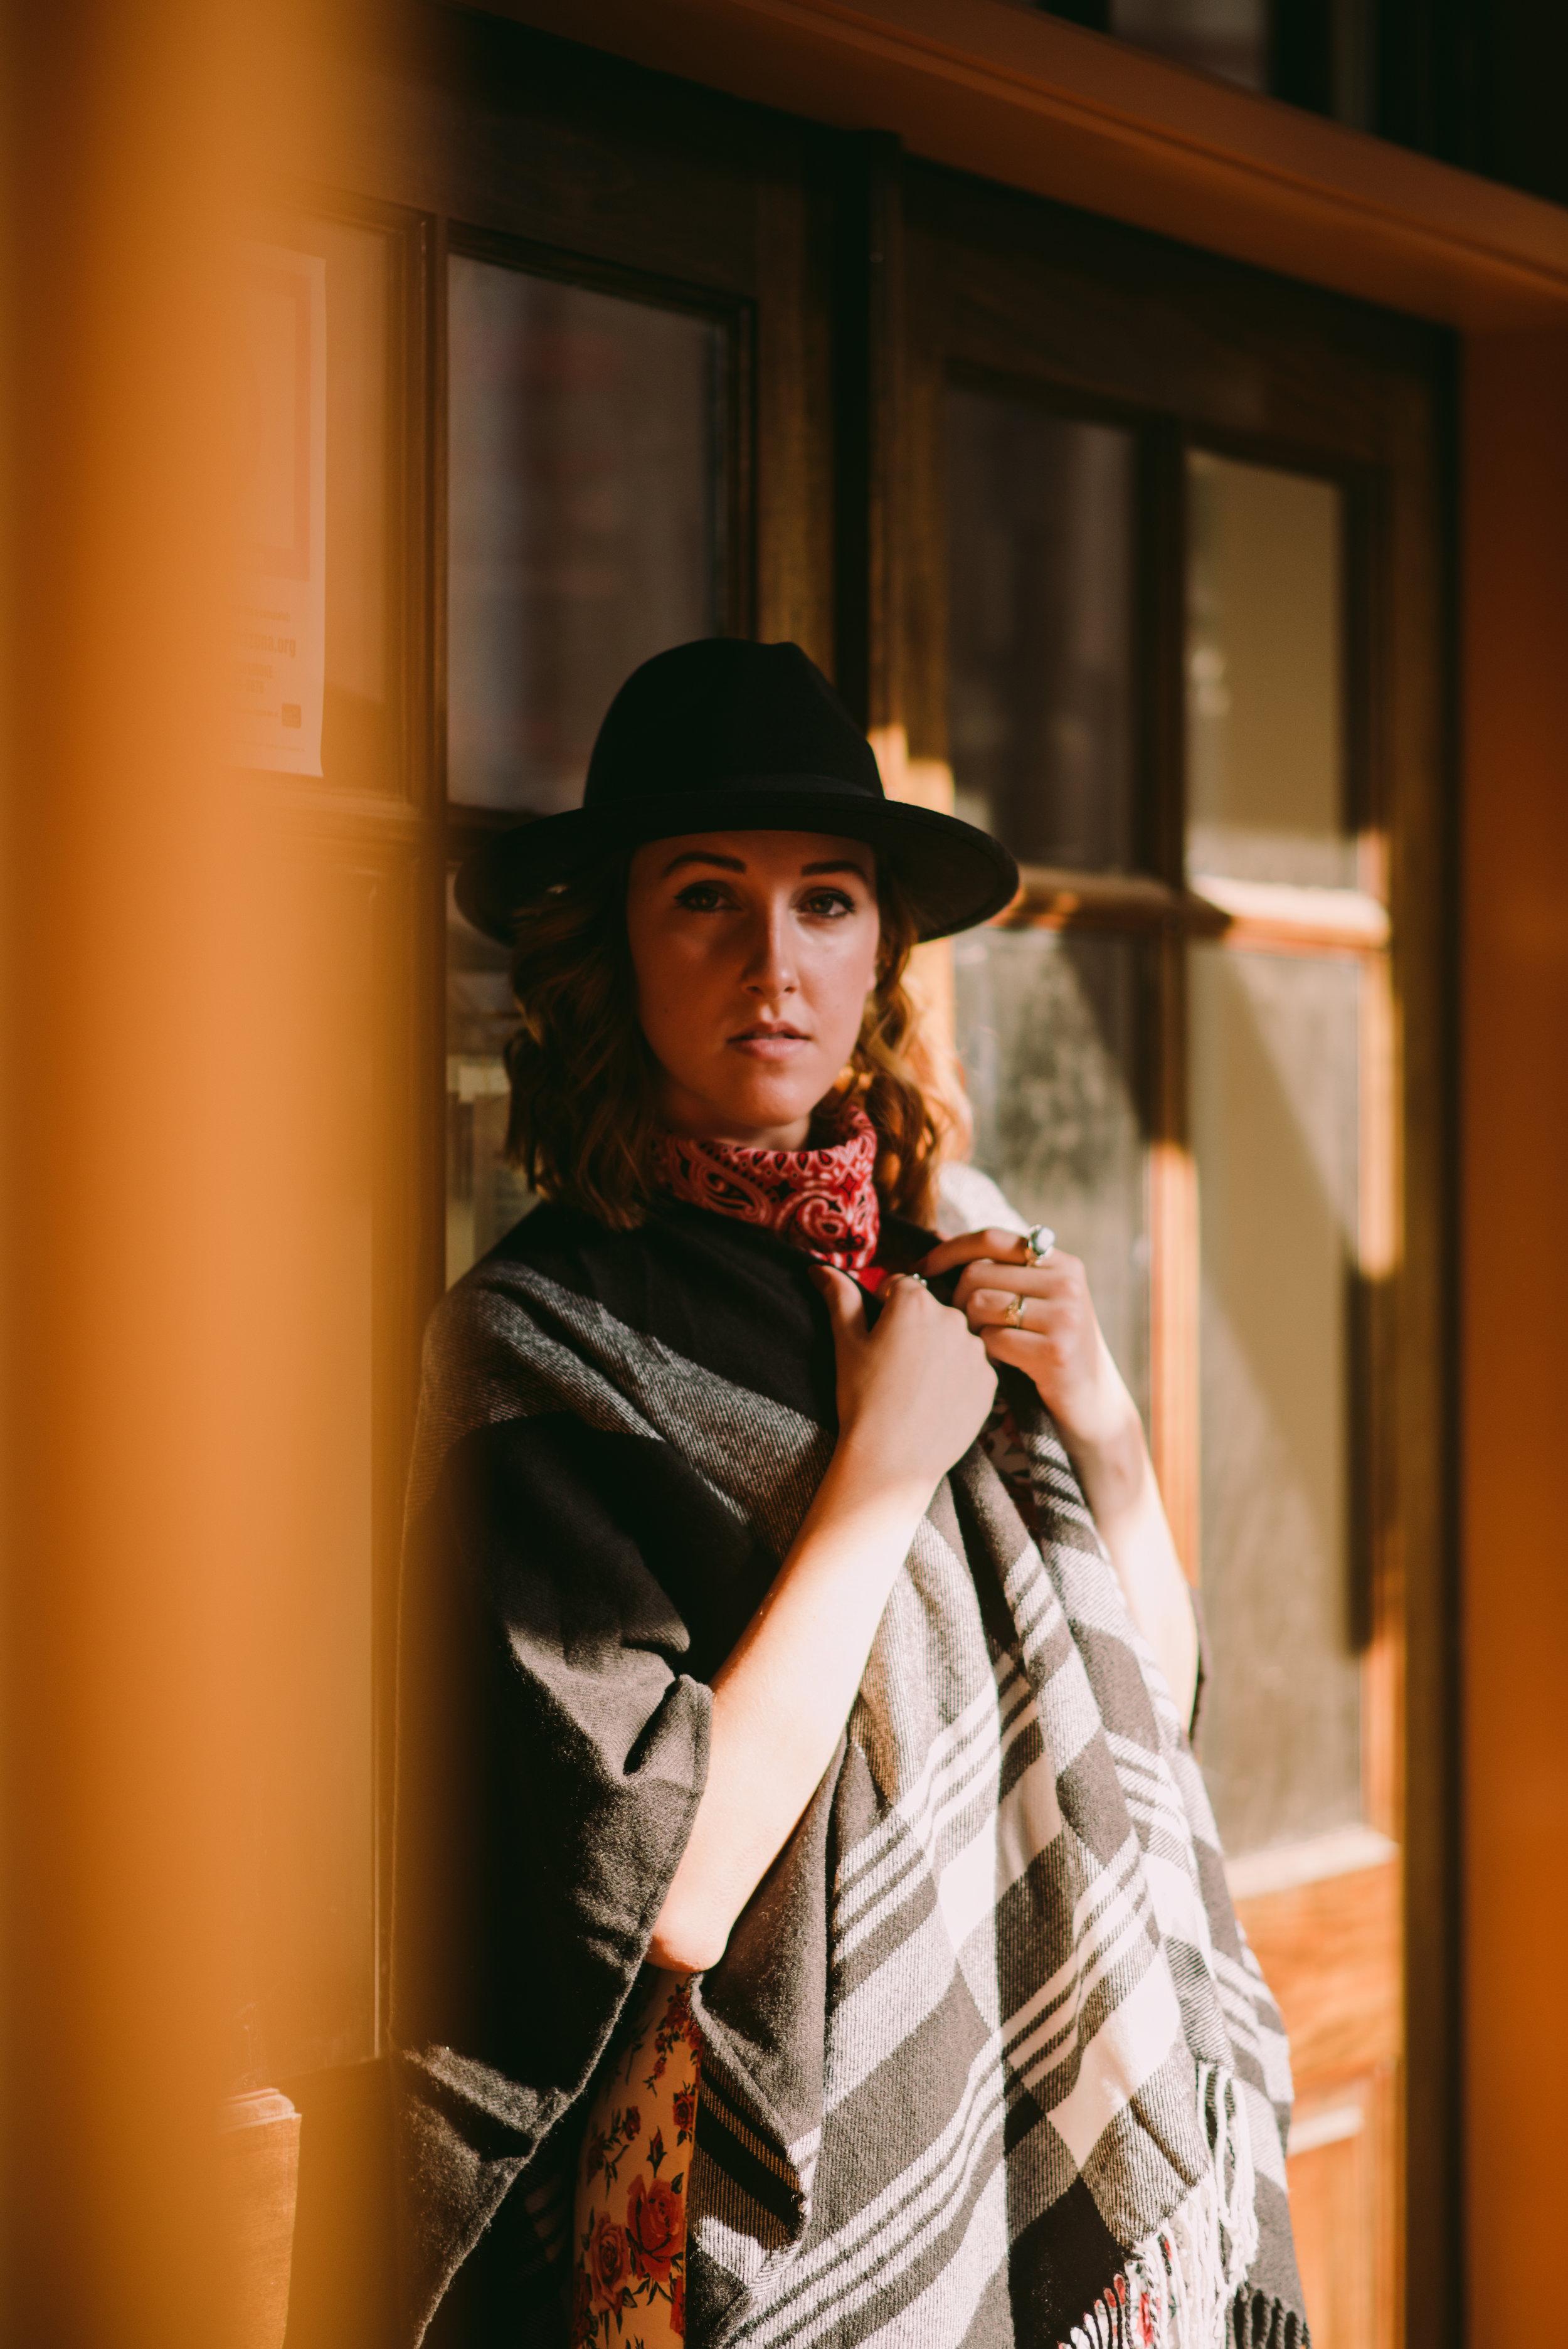 Josie_Western_PhoenixArizonaPortraitPhotographer_SamanthaRosePhotography_final_059.JPG